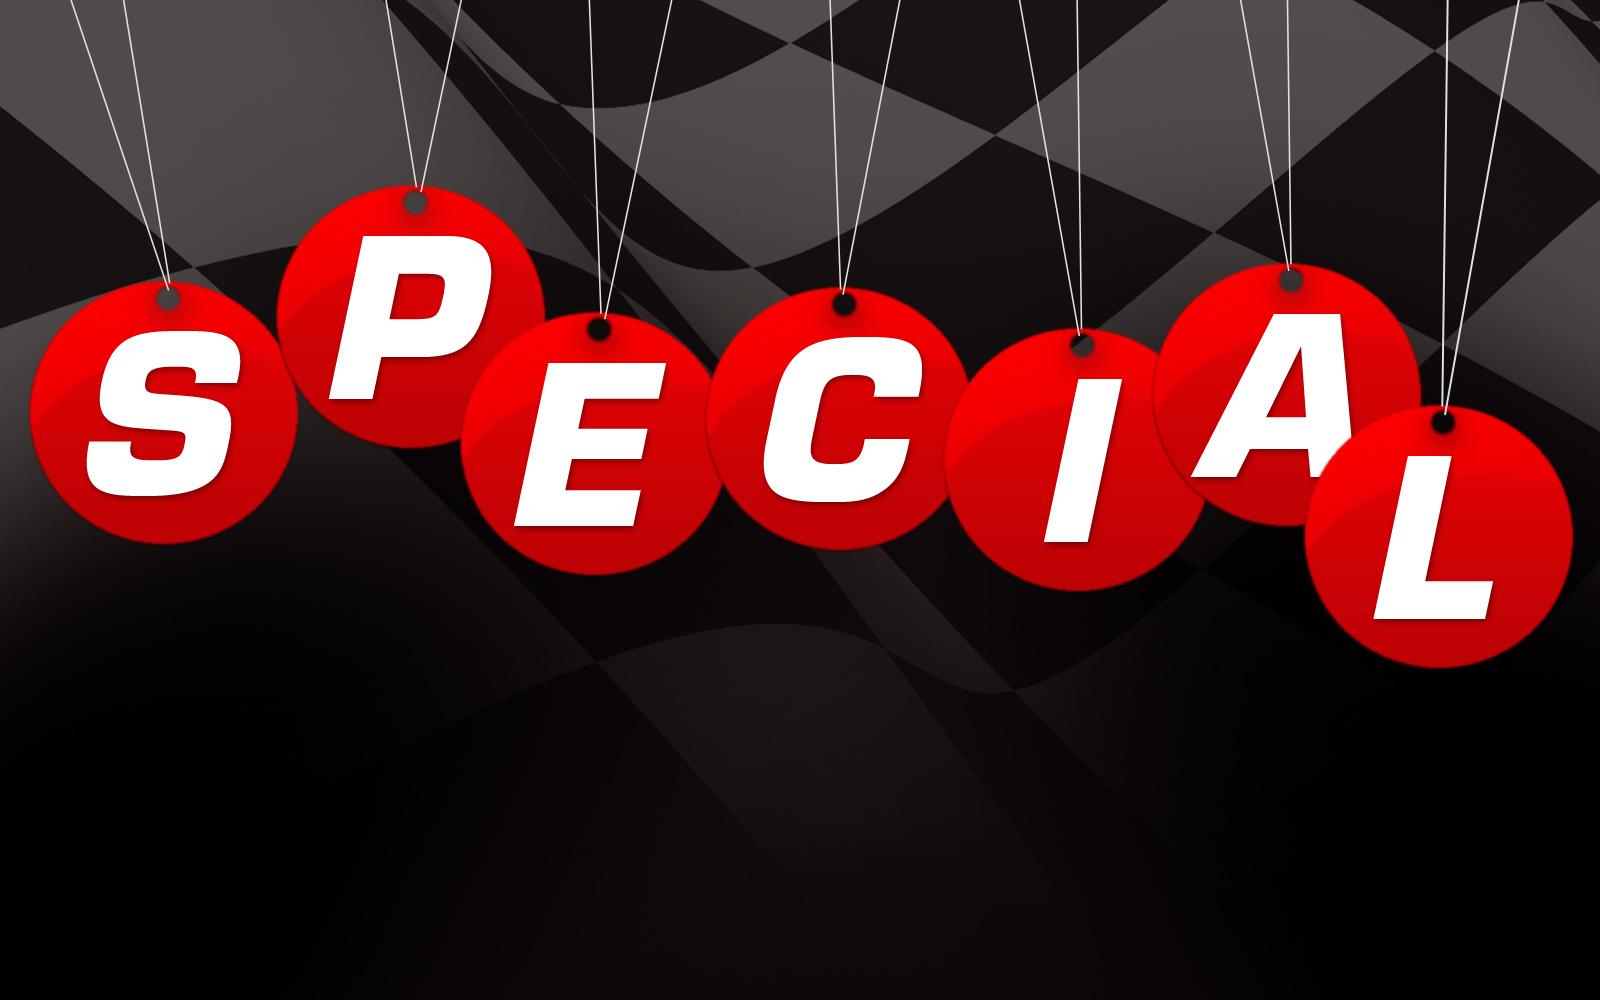 Current Carrera offers & promos